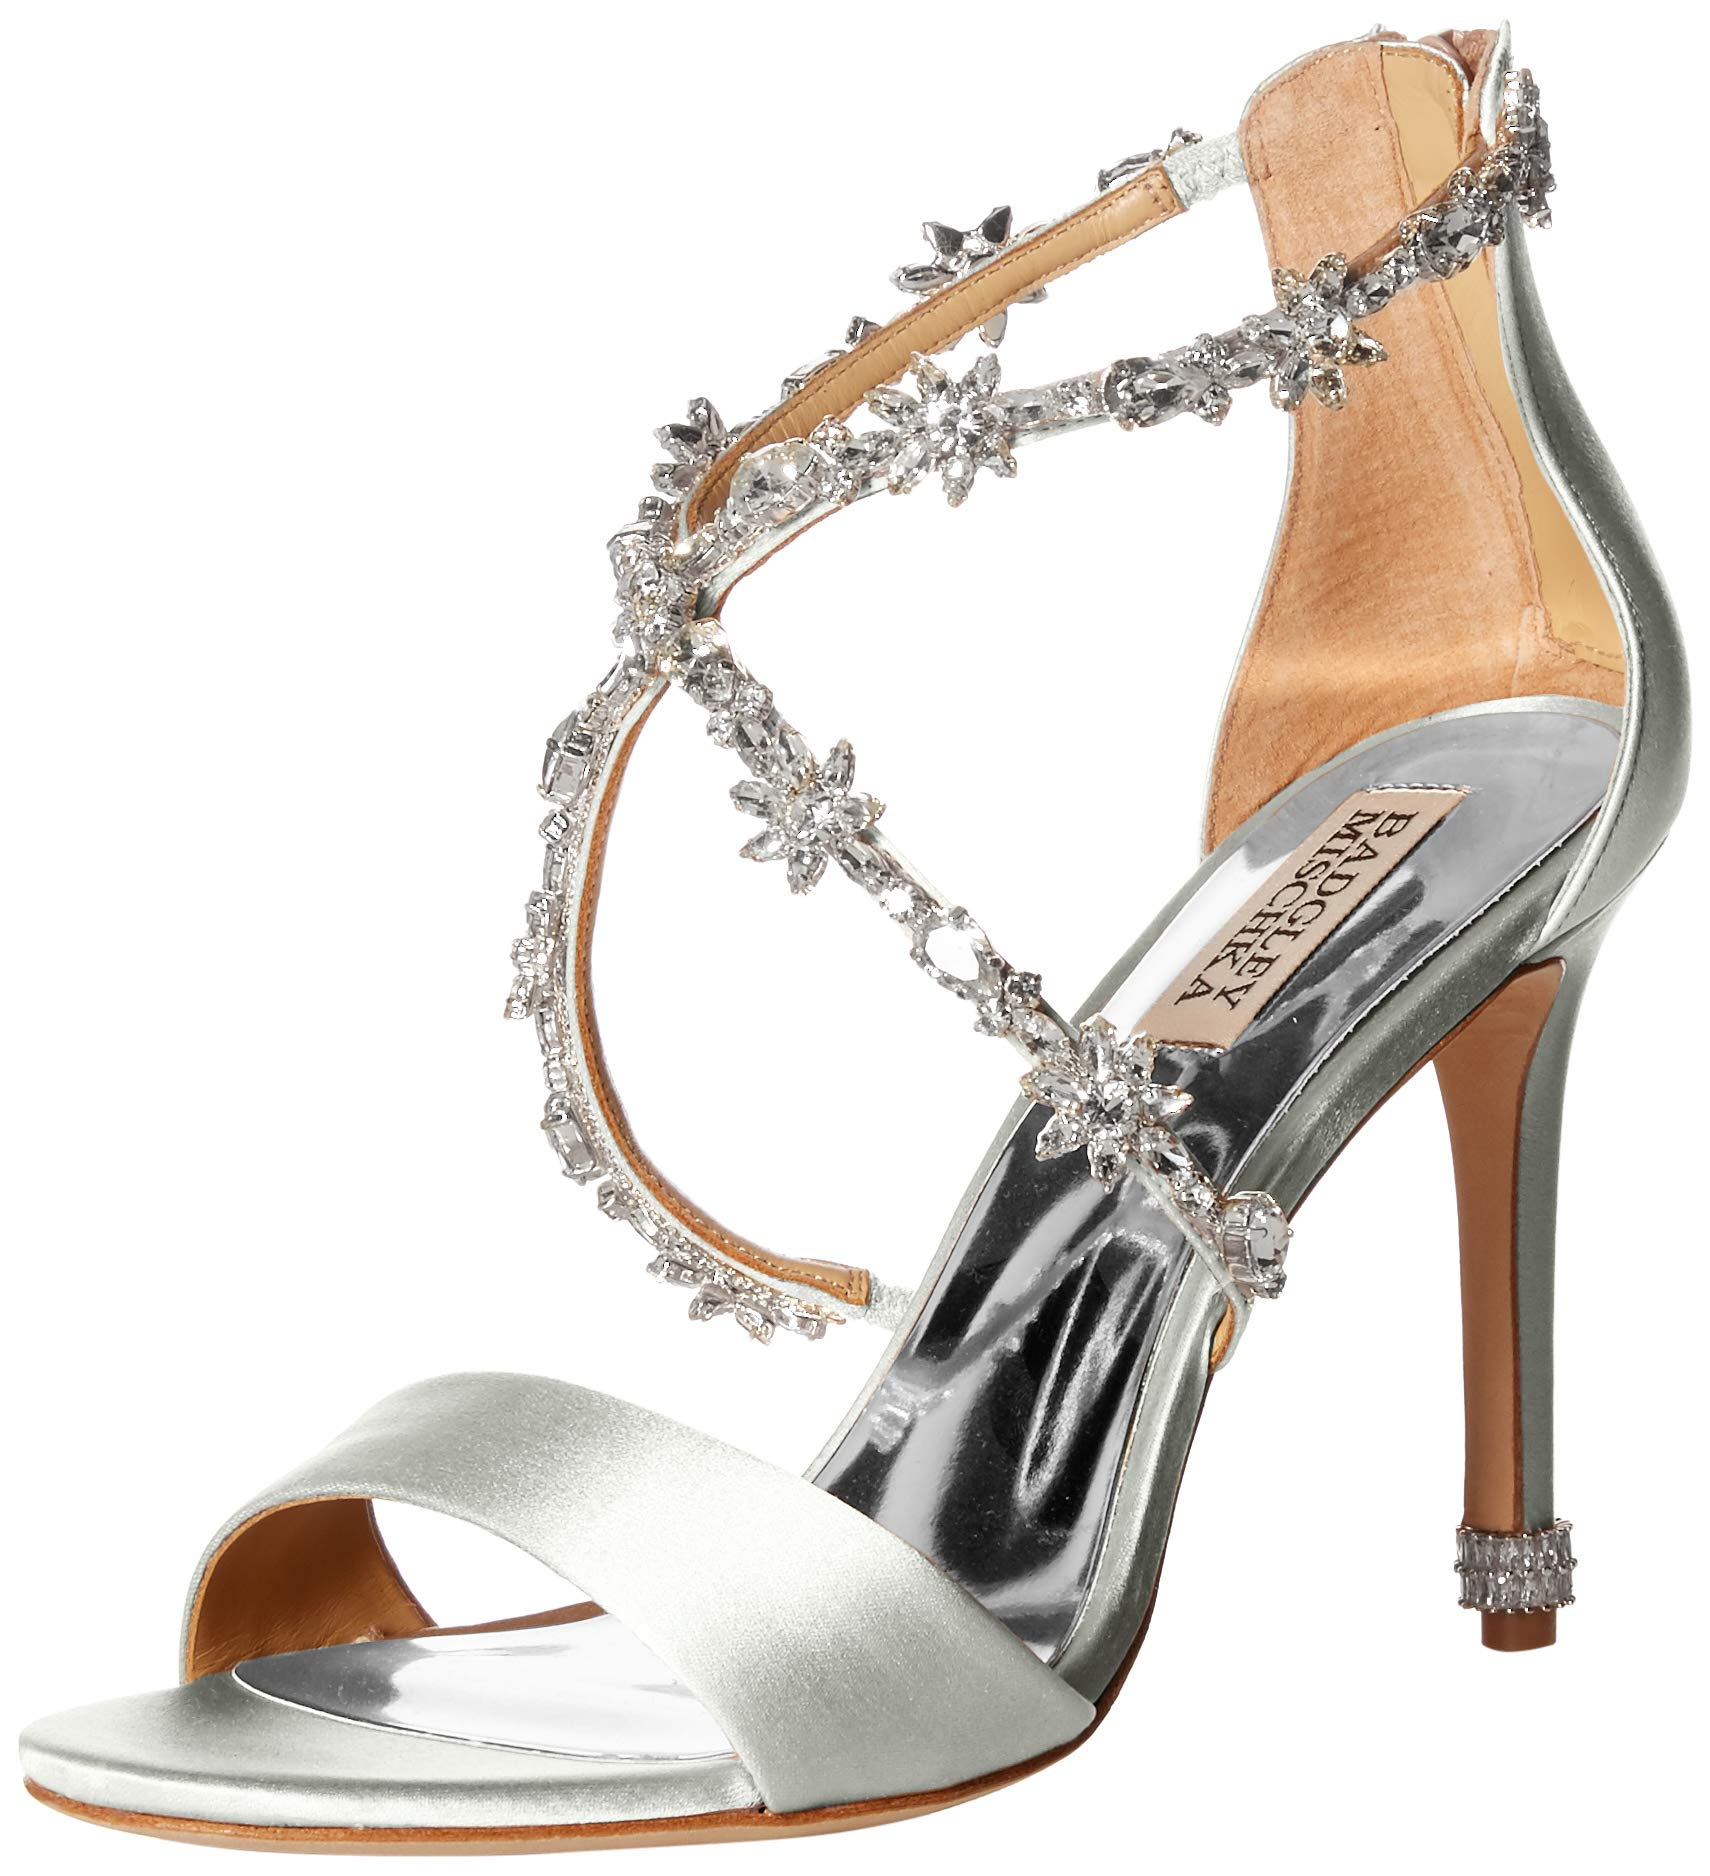 Badgley Mischka Women's Venus Heeled Sandal, Soft White Satin, 6 M US